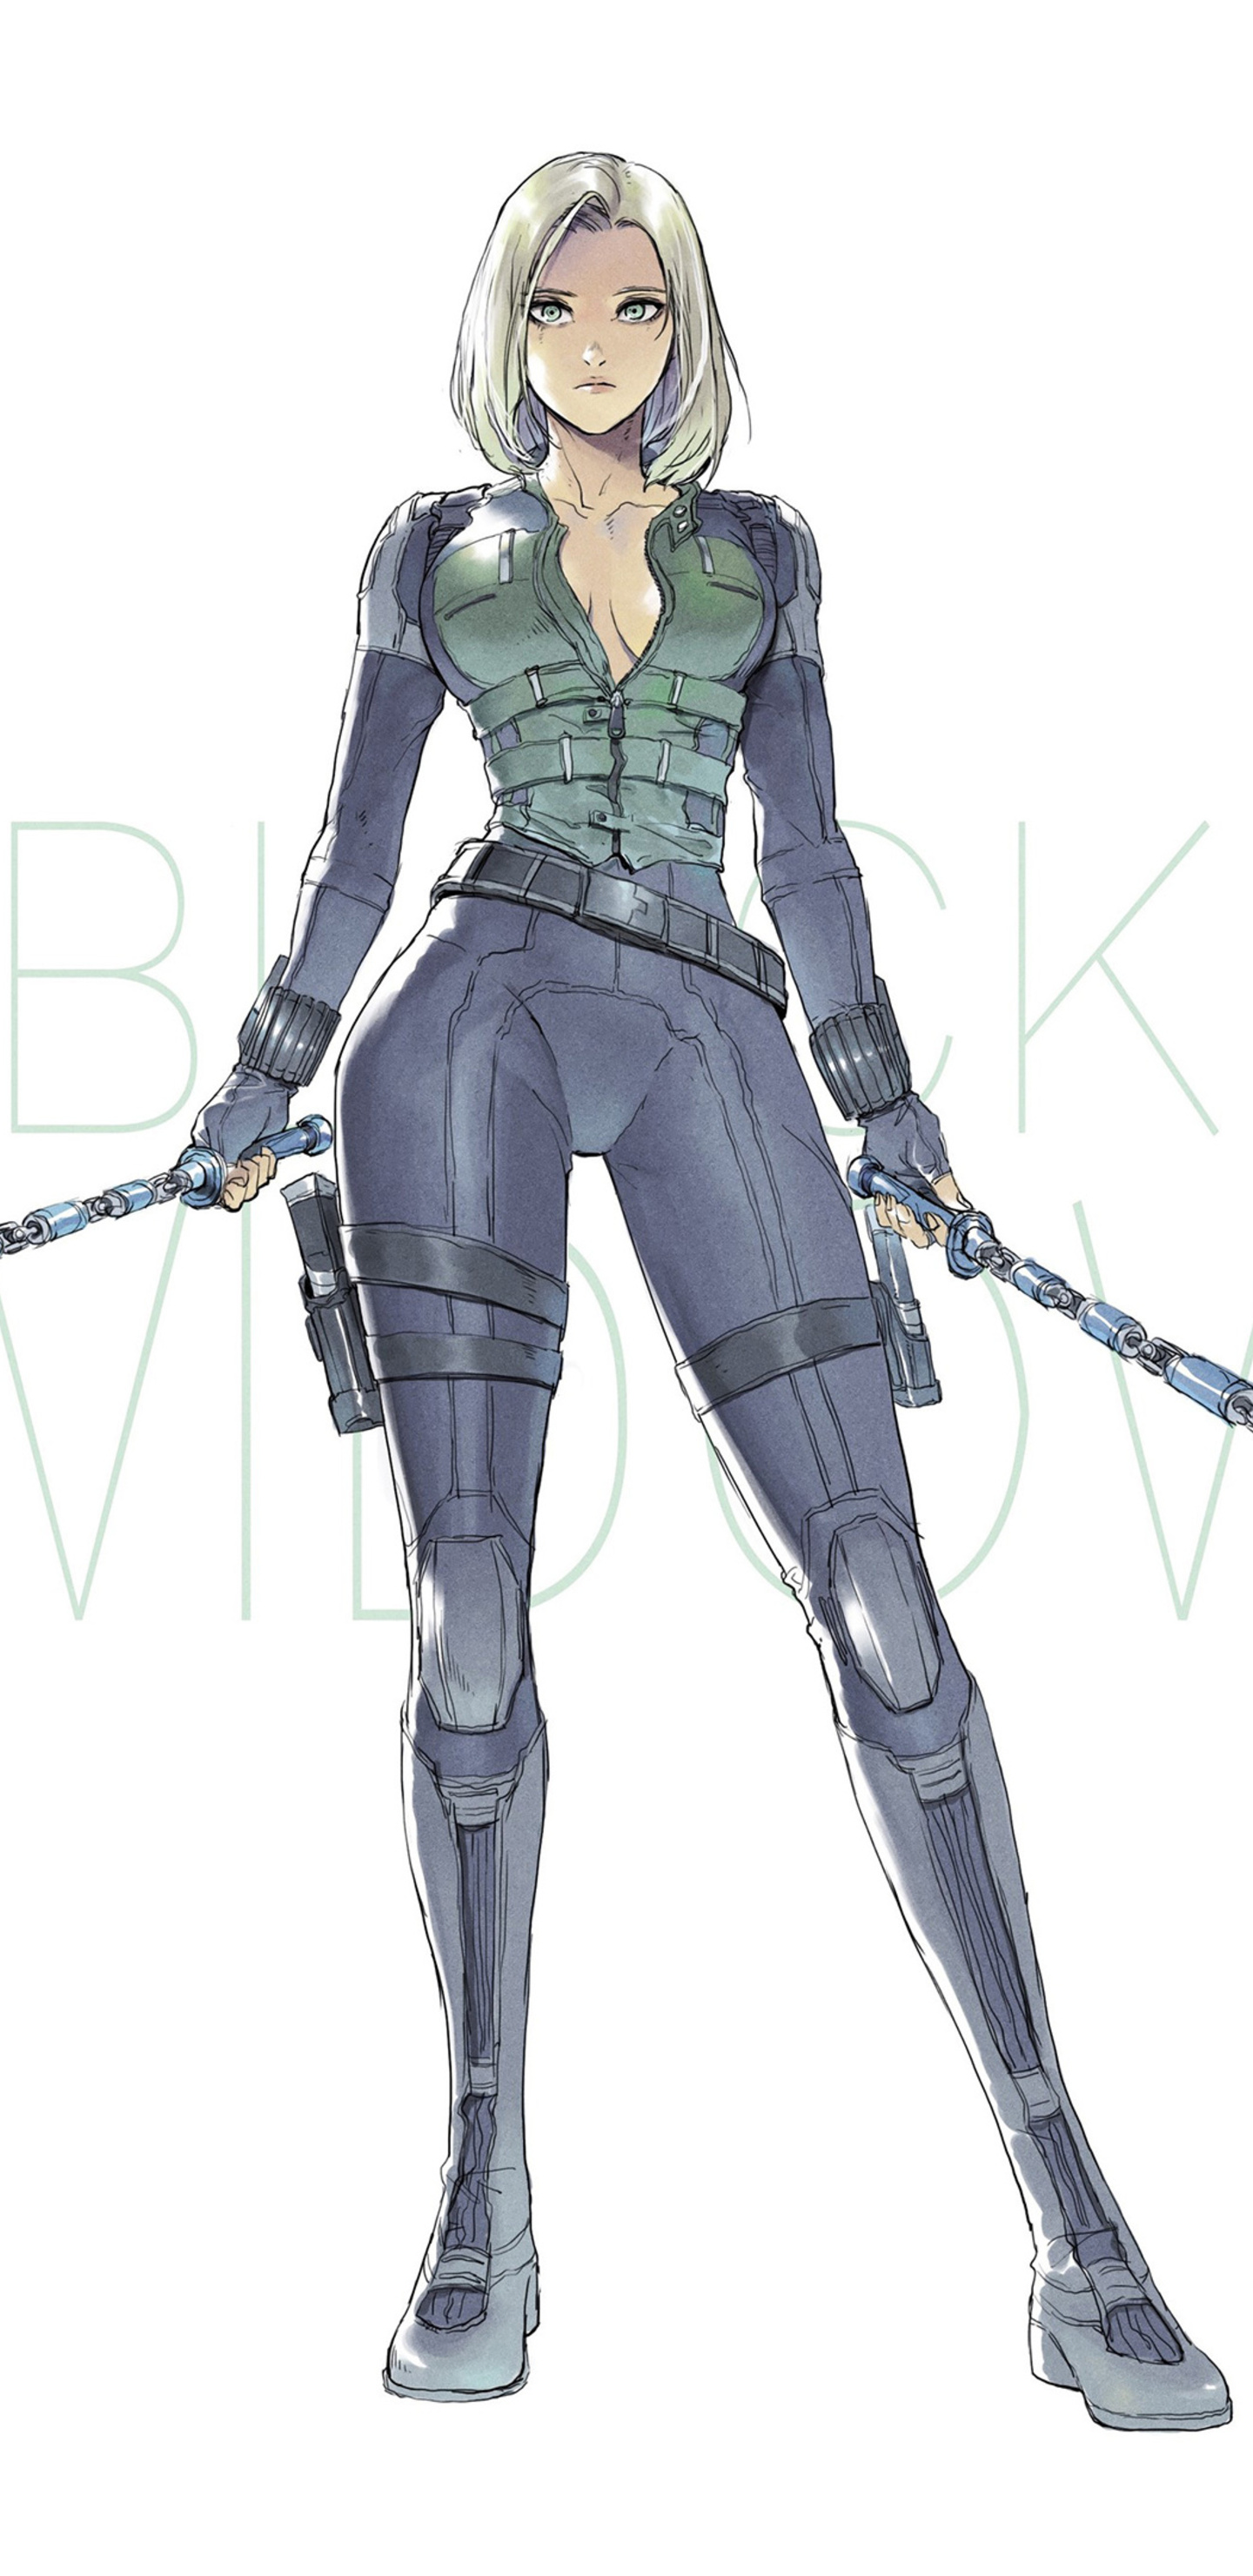 black-widow-artwork-for-avengers-infinity-war-so.jpg